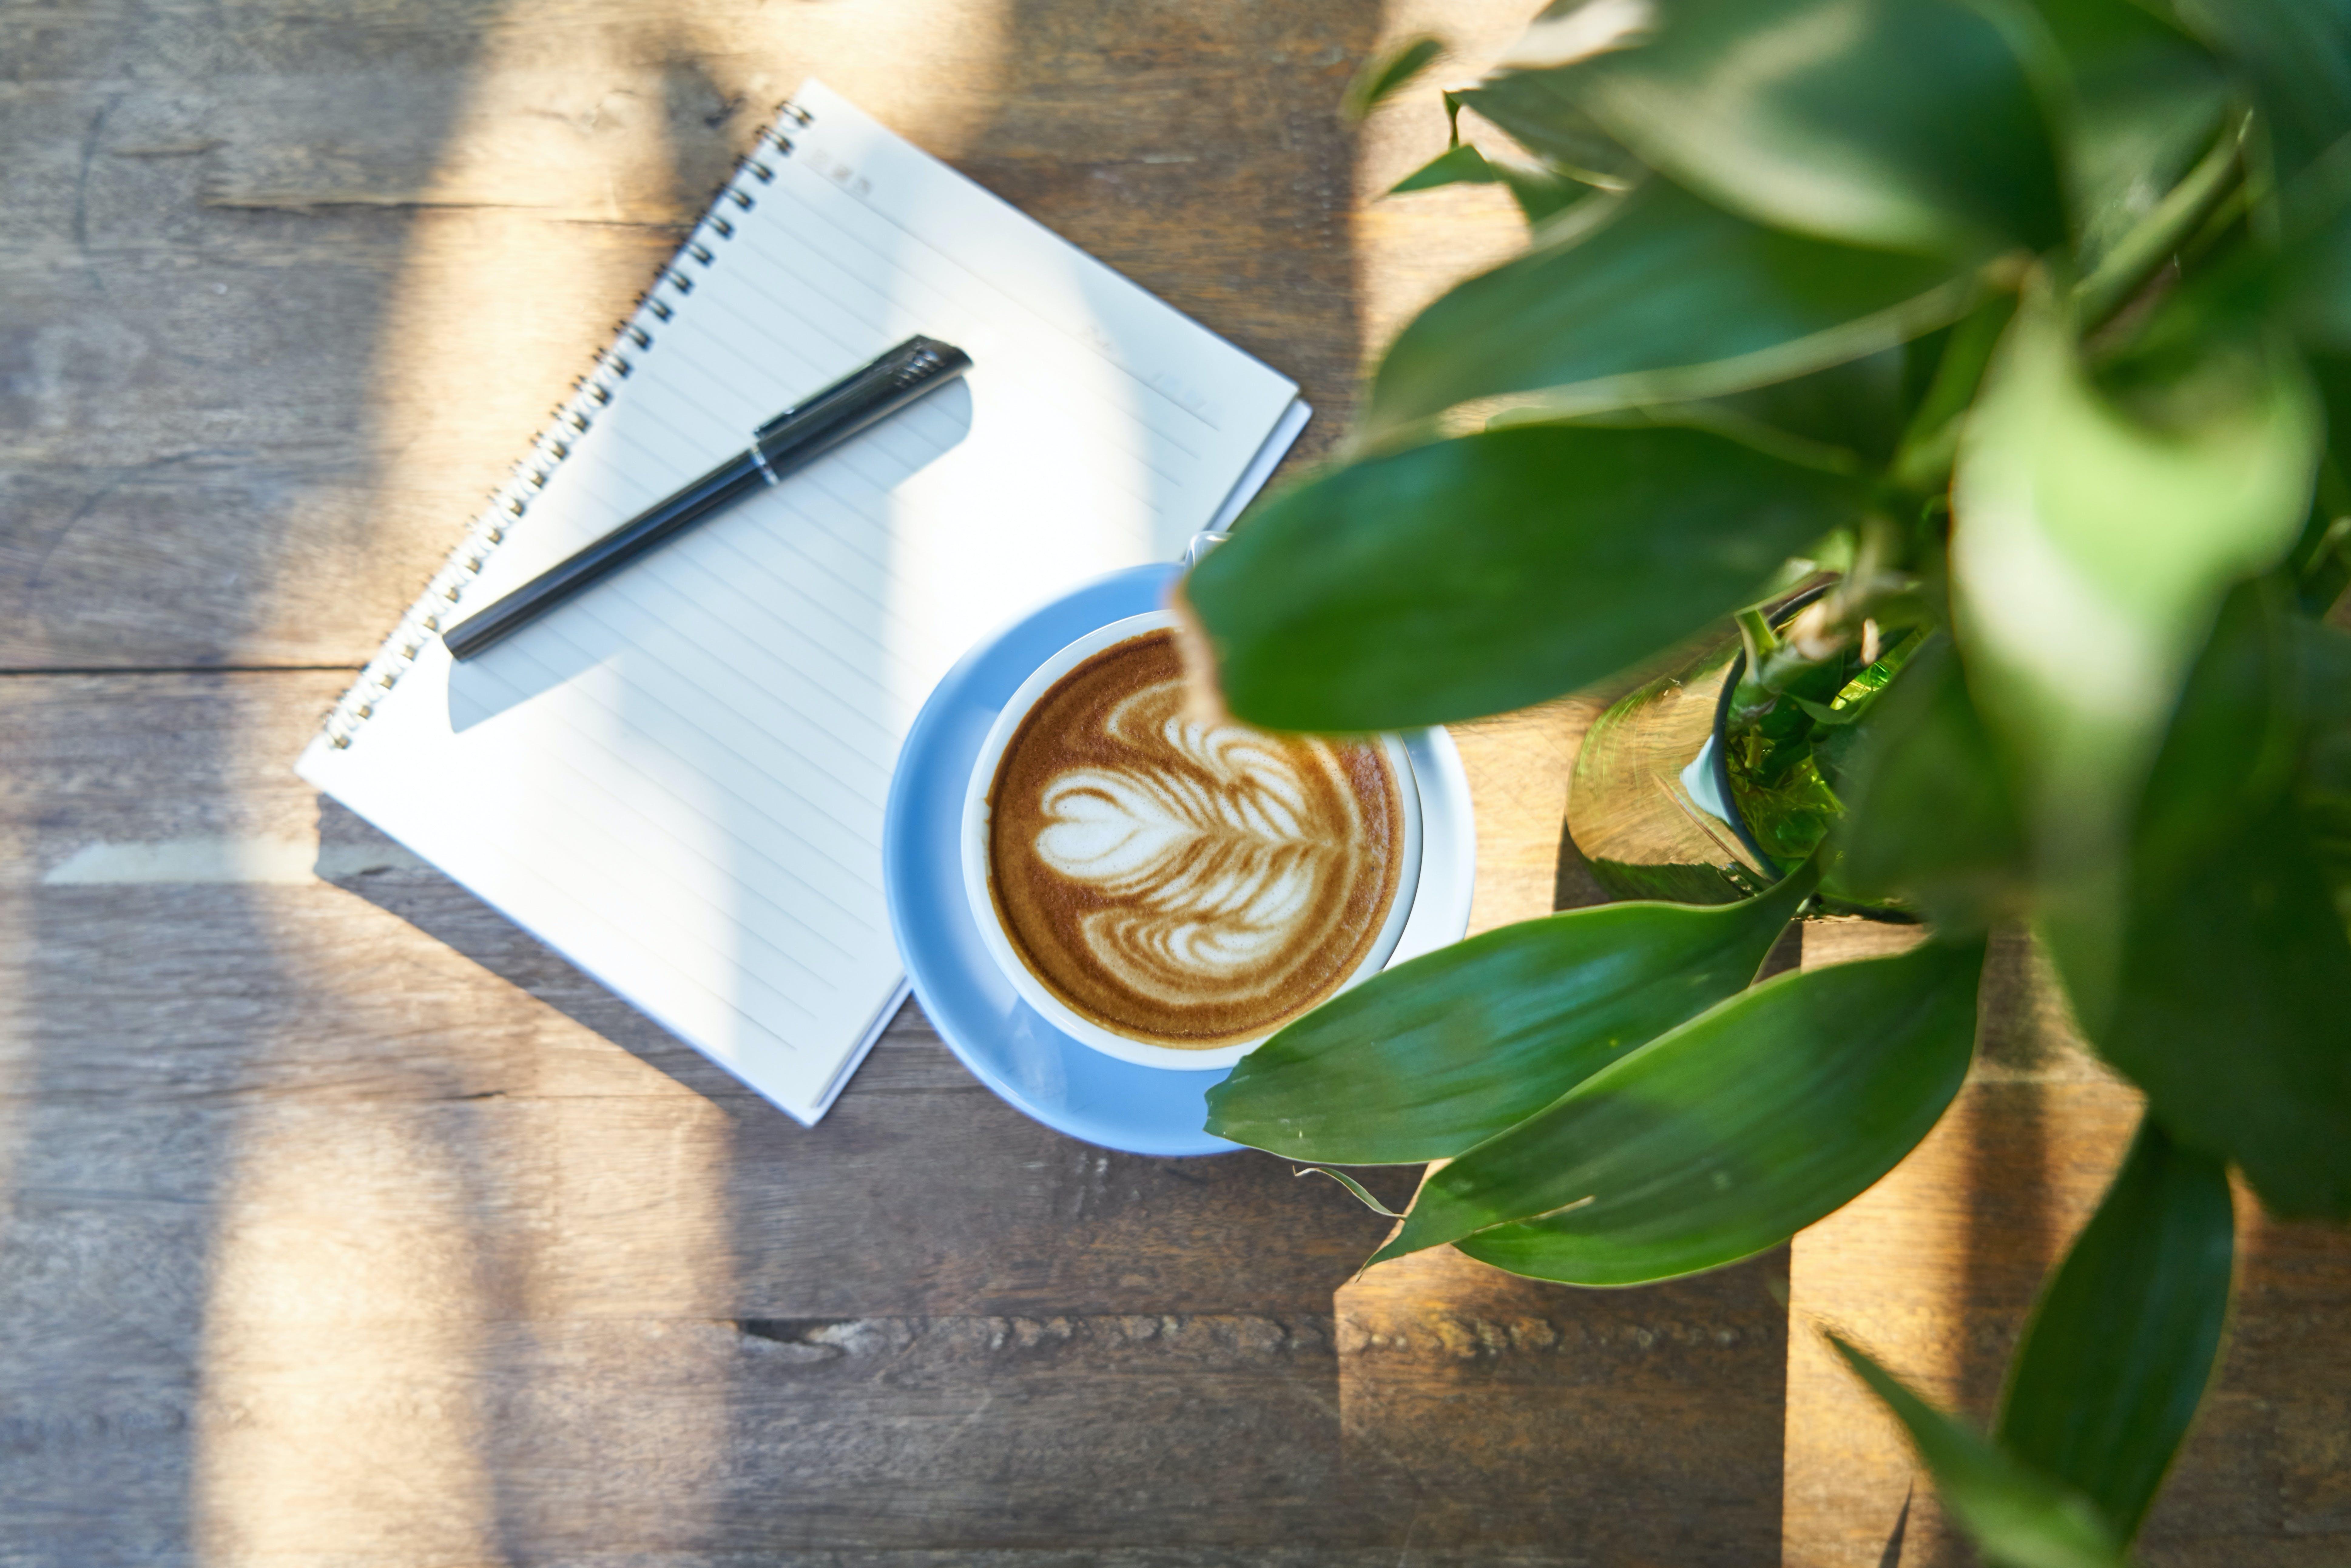 bebida, caderno, café